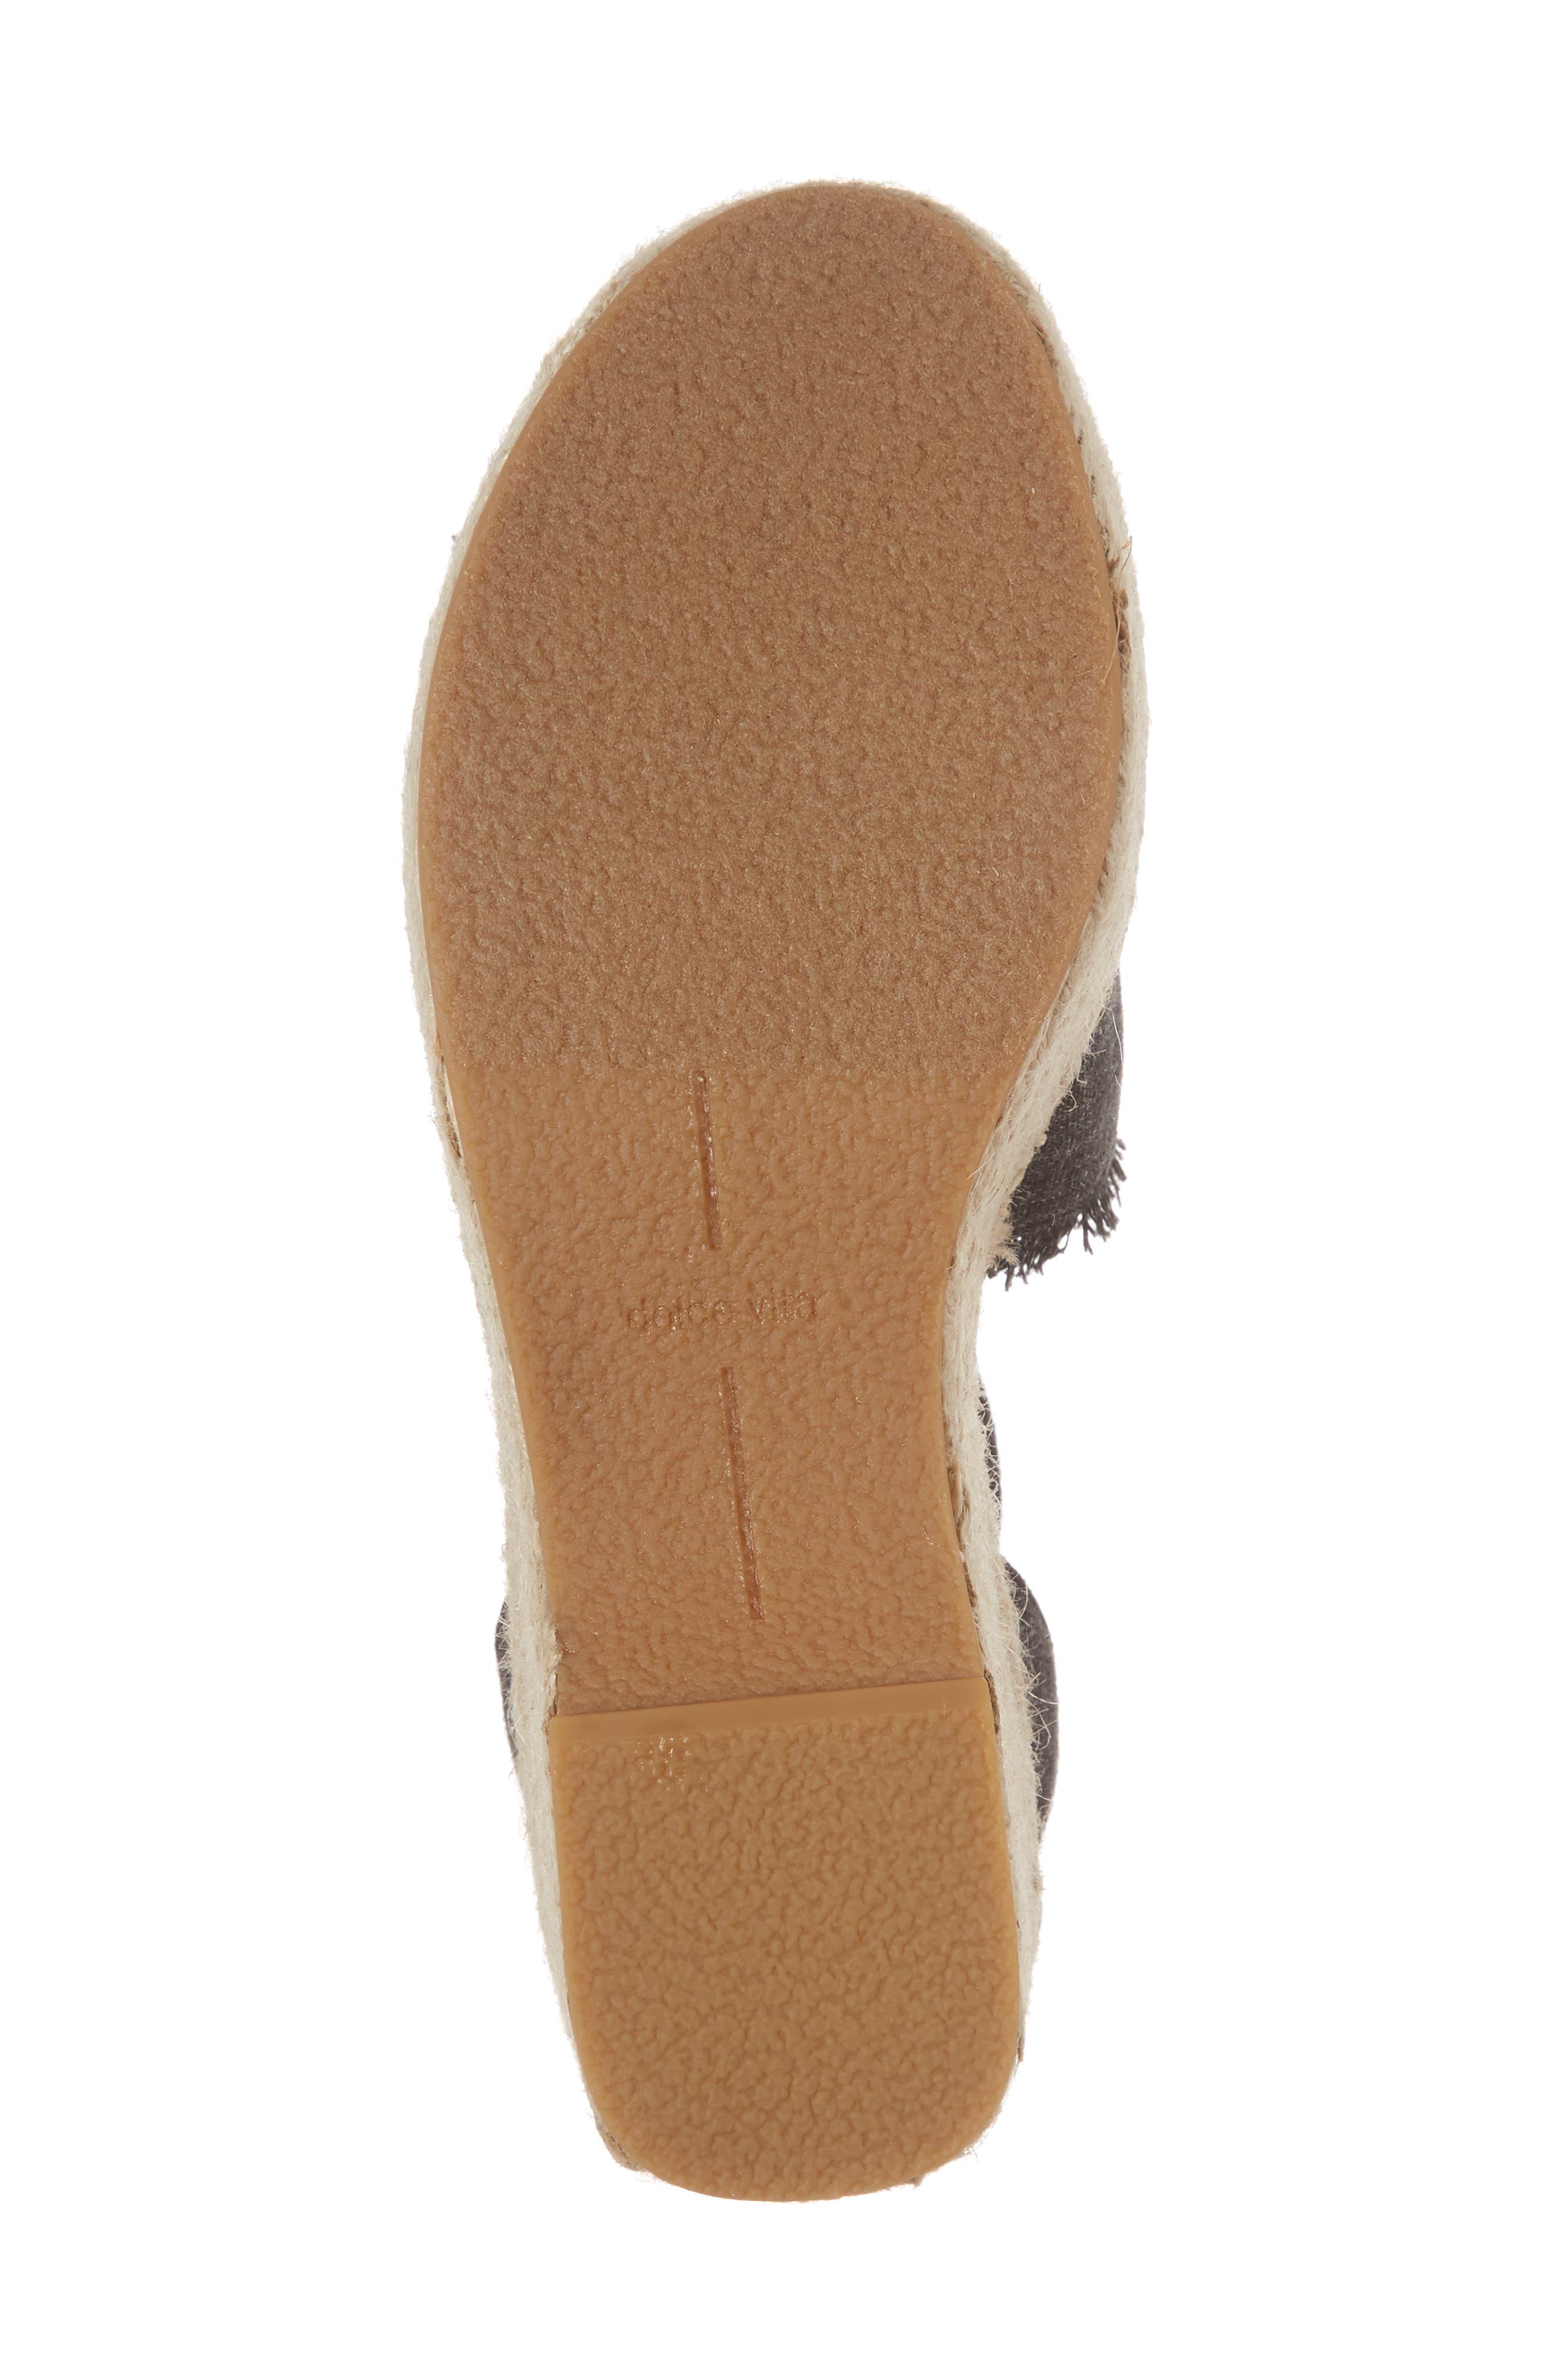 Lesly Espadrille Platform Sandal,                             Alternate thumbnail 37, color,